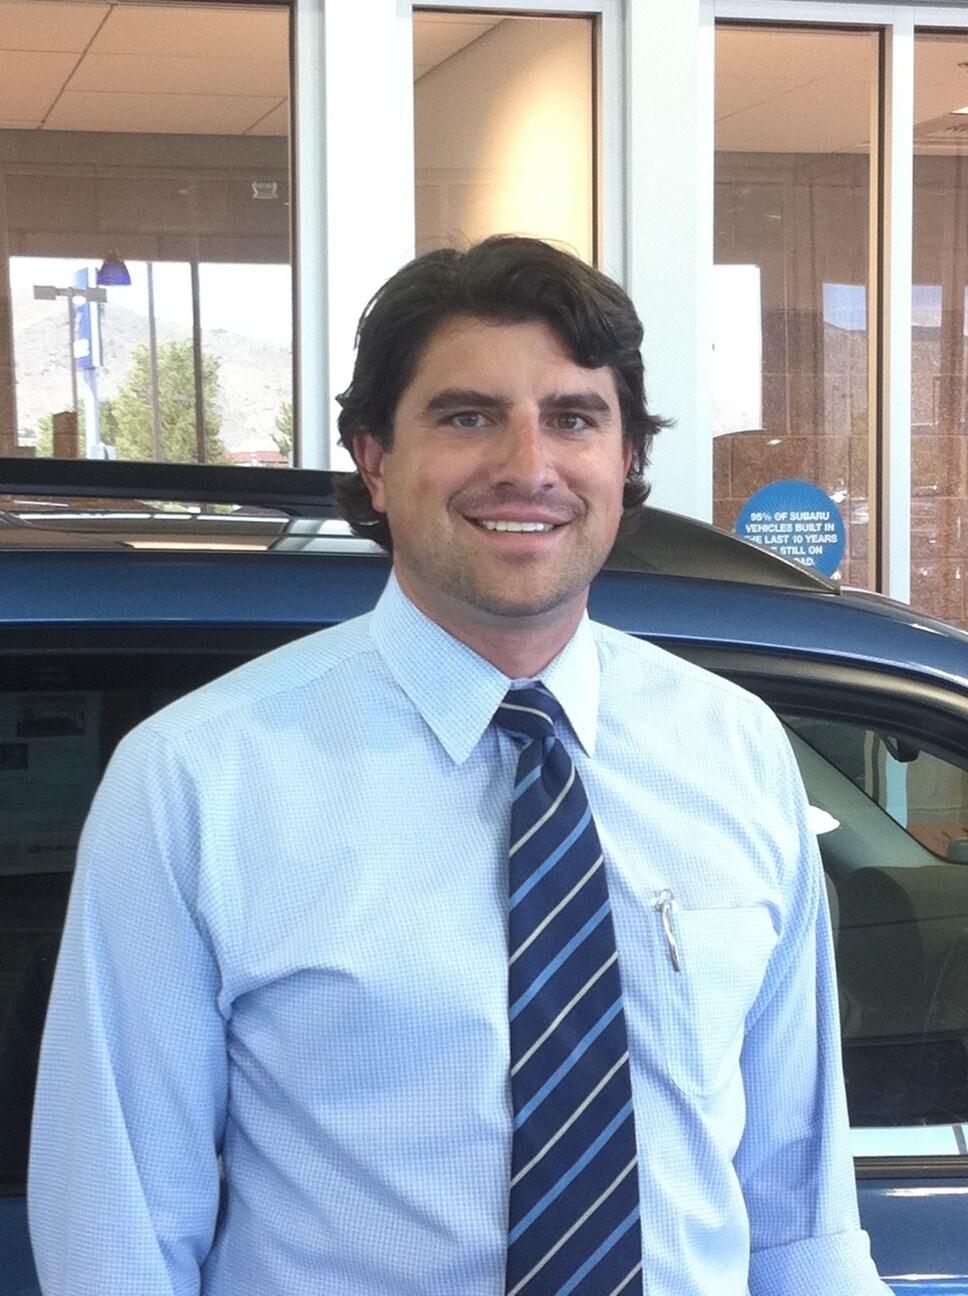 Used Cars Carson City >> Michael Hohl Subaru - Staff | Michael Hohl Subaru